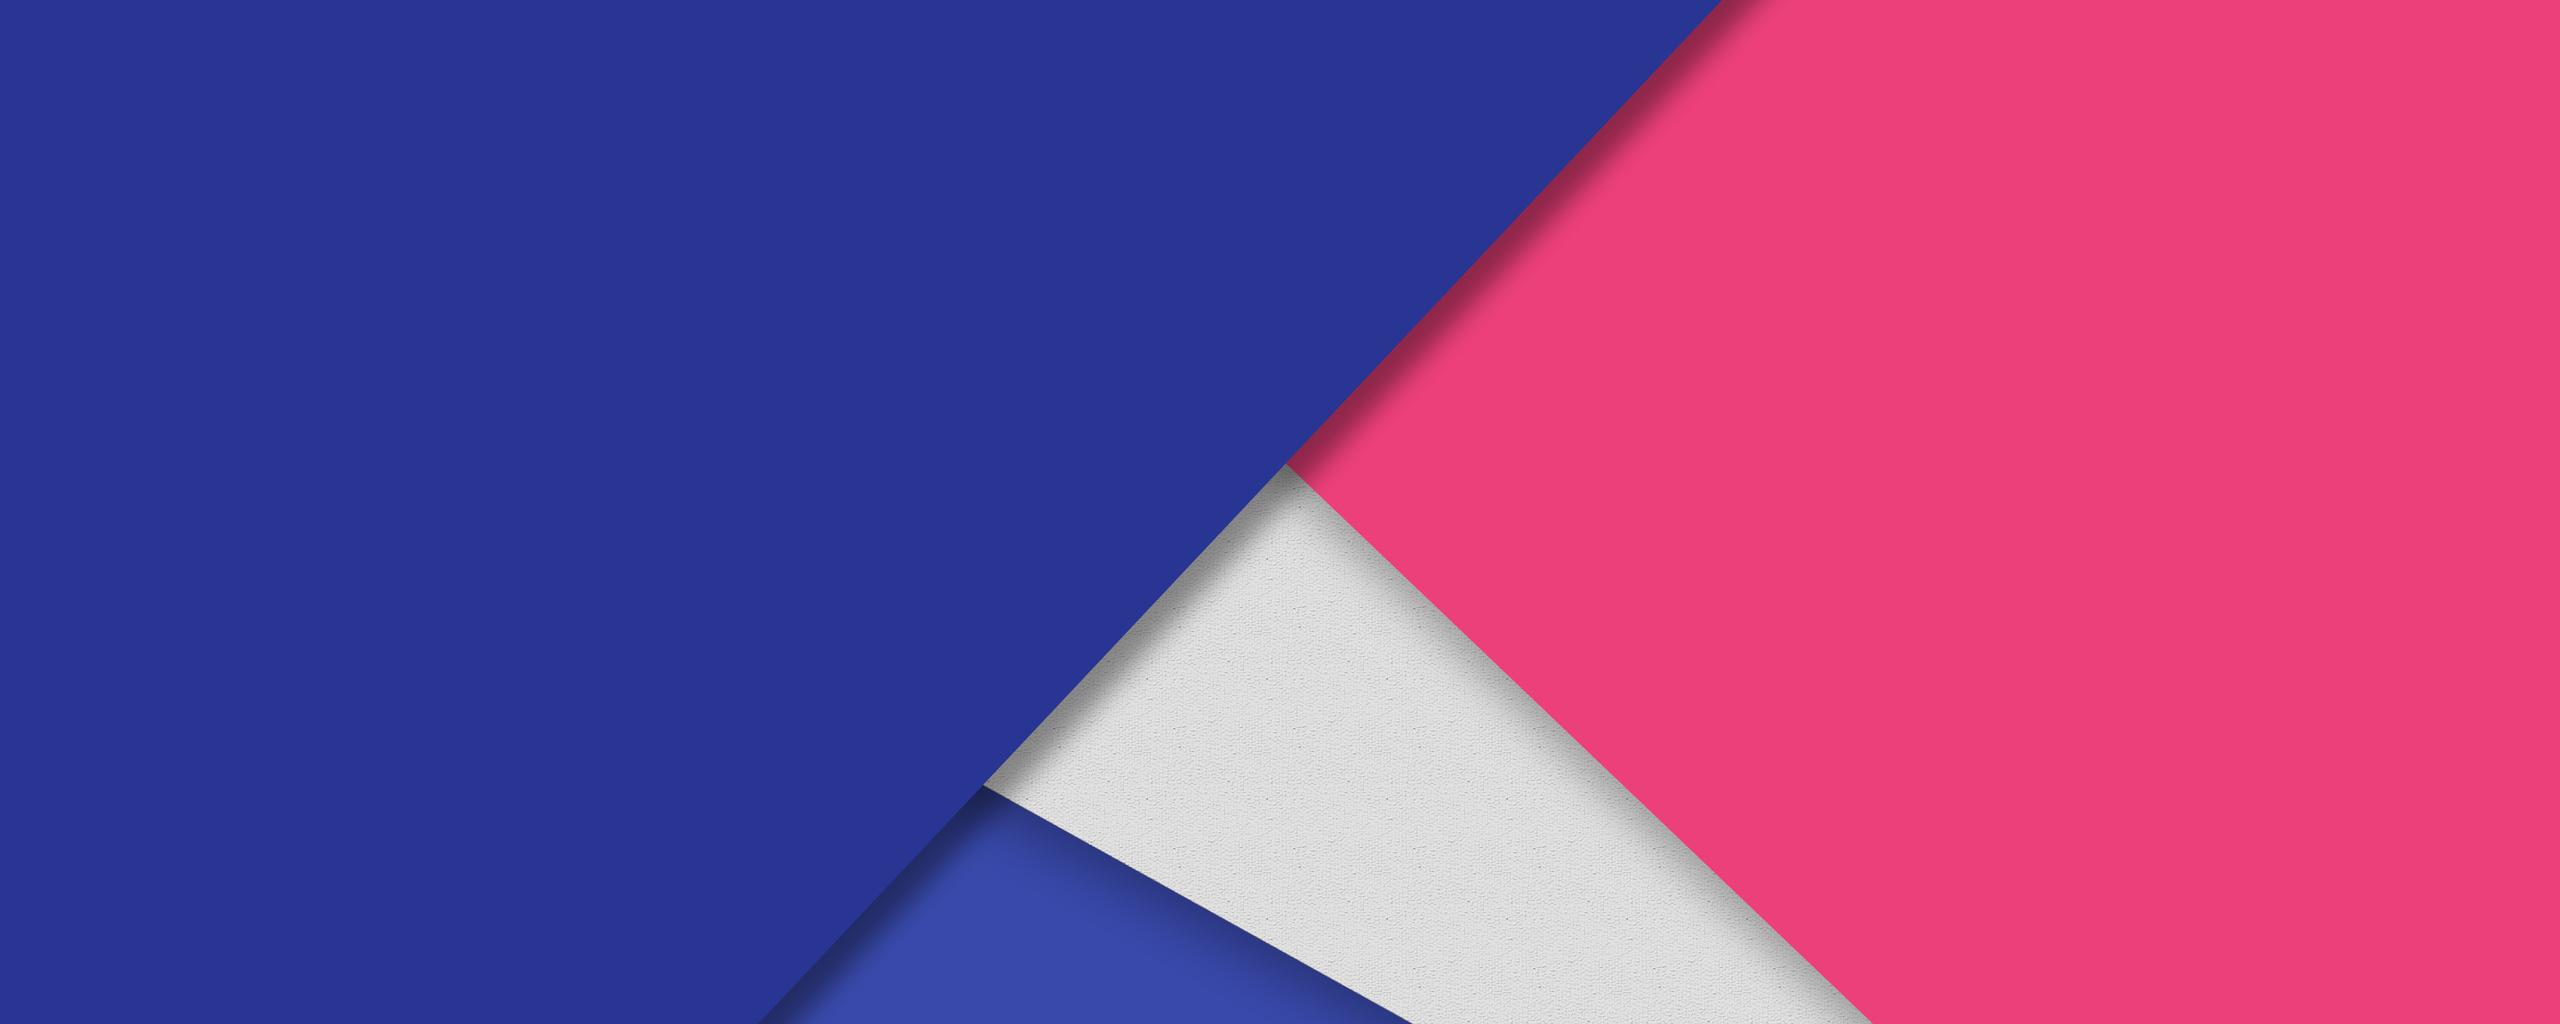 material-dark-design-xq.jpg